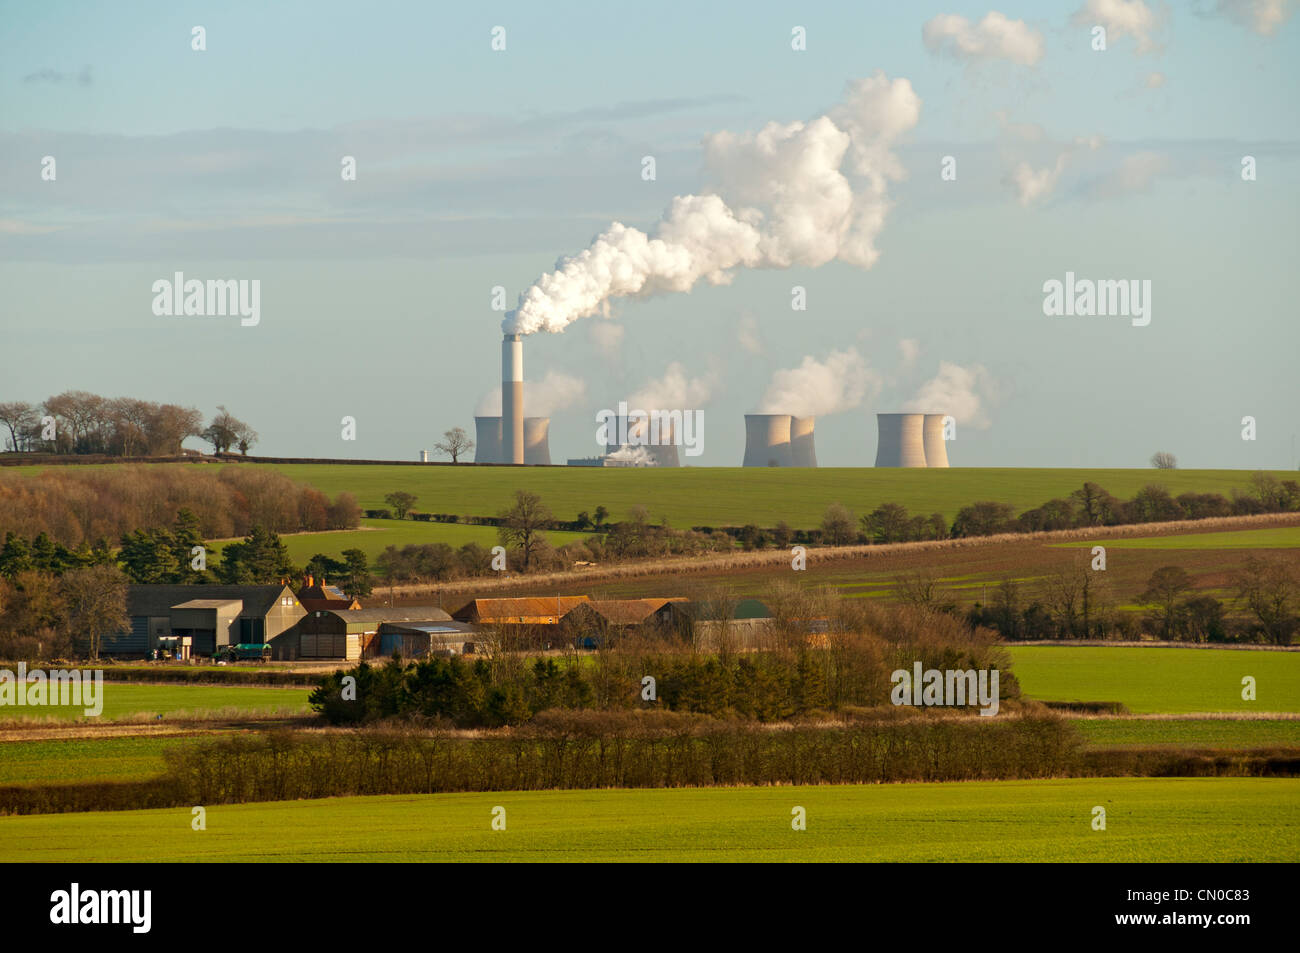 The cooling towers of Cottam Power Station, near Retford, Nottinghamshire, England, UK - Stock Image